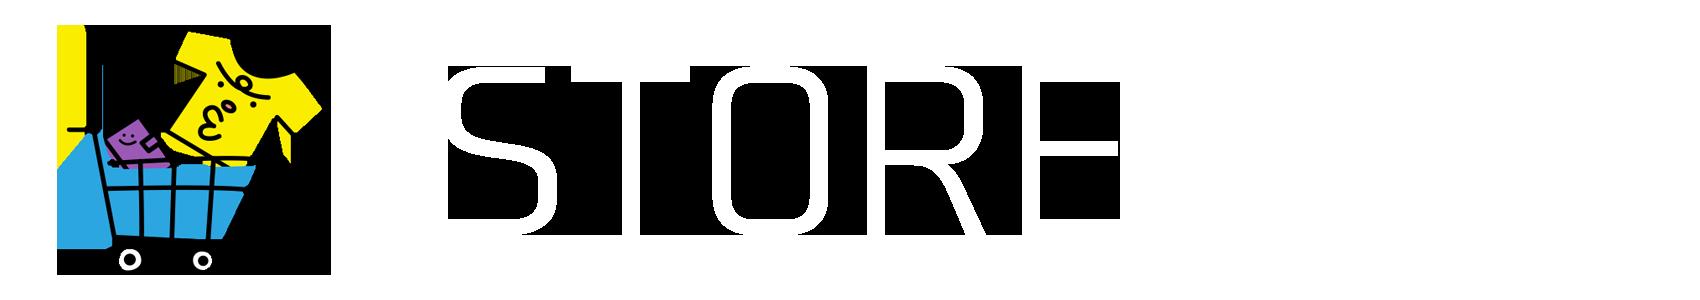 STORE(ECサイトリンク一覧) – 株式会社リズム